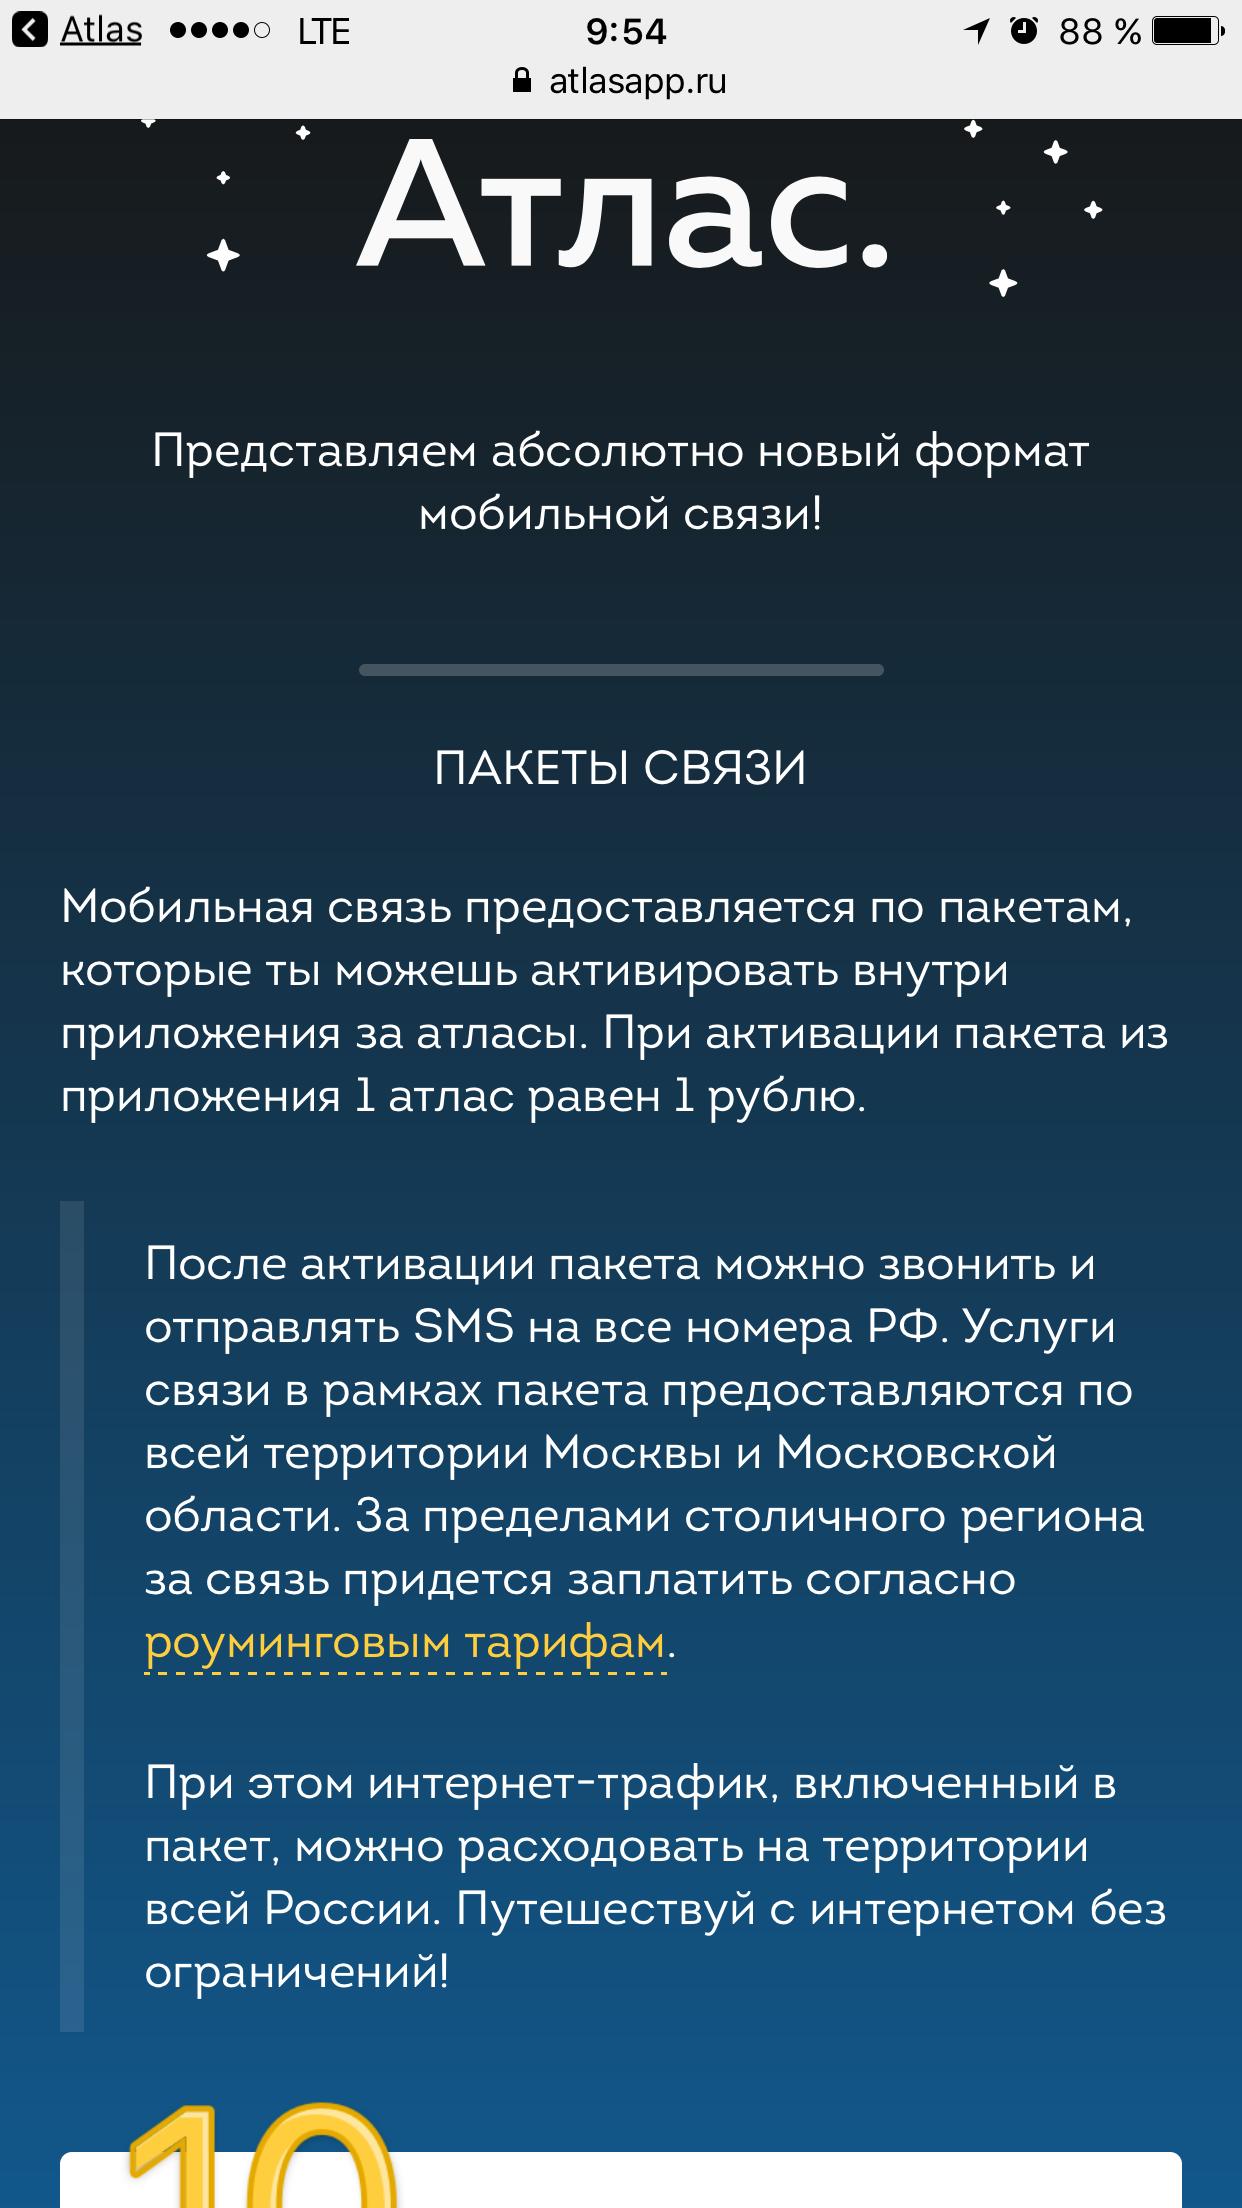 сайт халява ру в москве